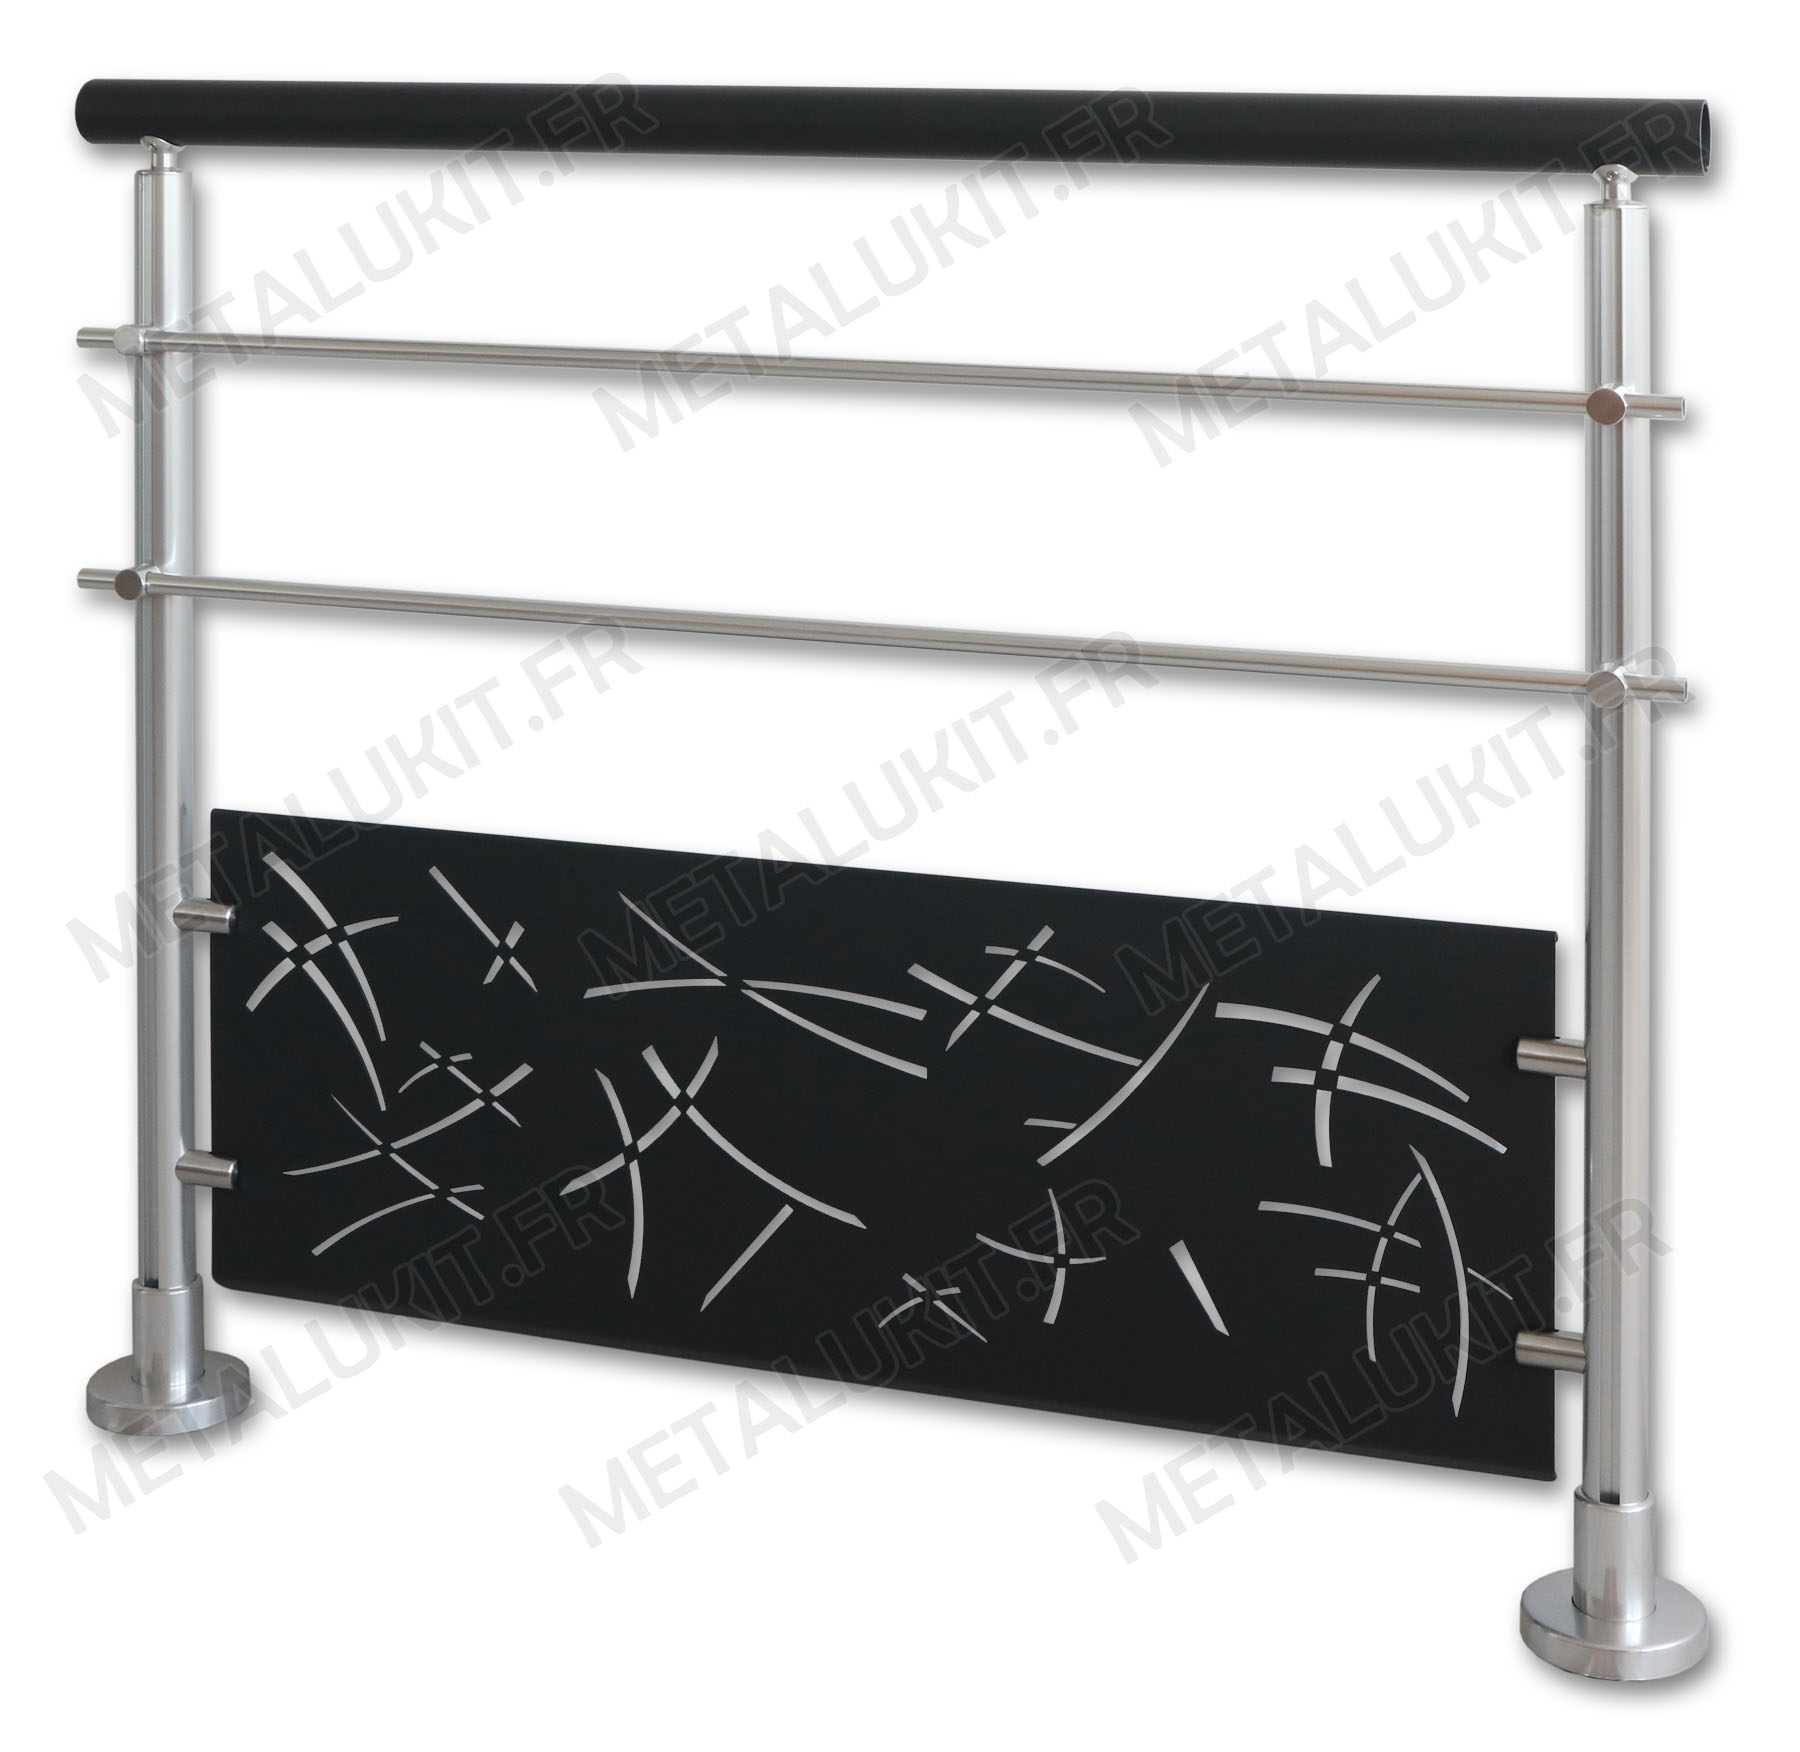 garde corps alu gris anthracite avec t le perfor e en kit. Black Bedroom Furniture Sets. Home Design Ideas